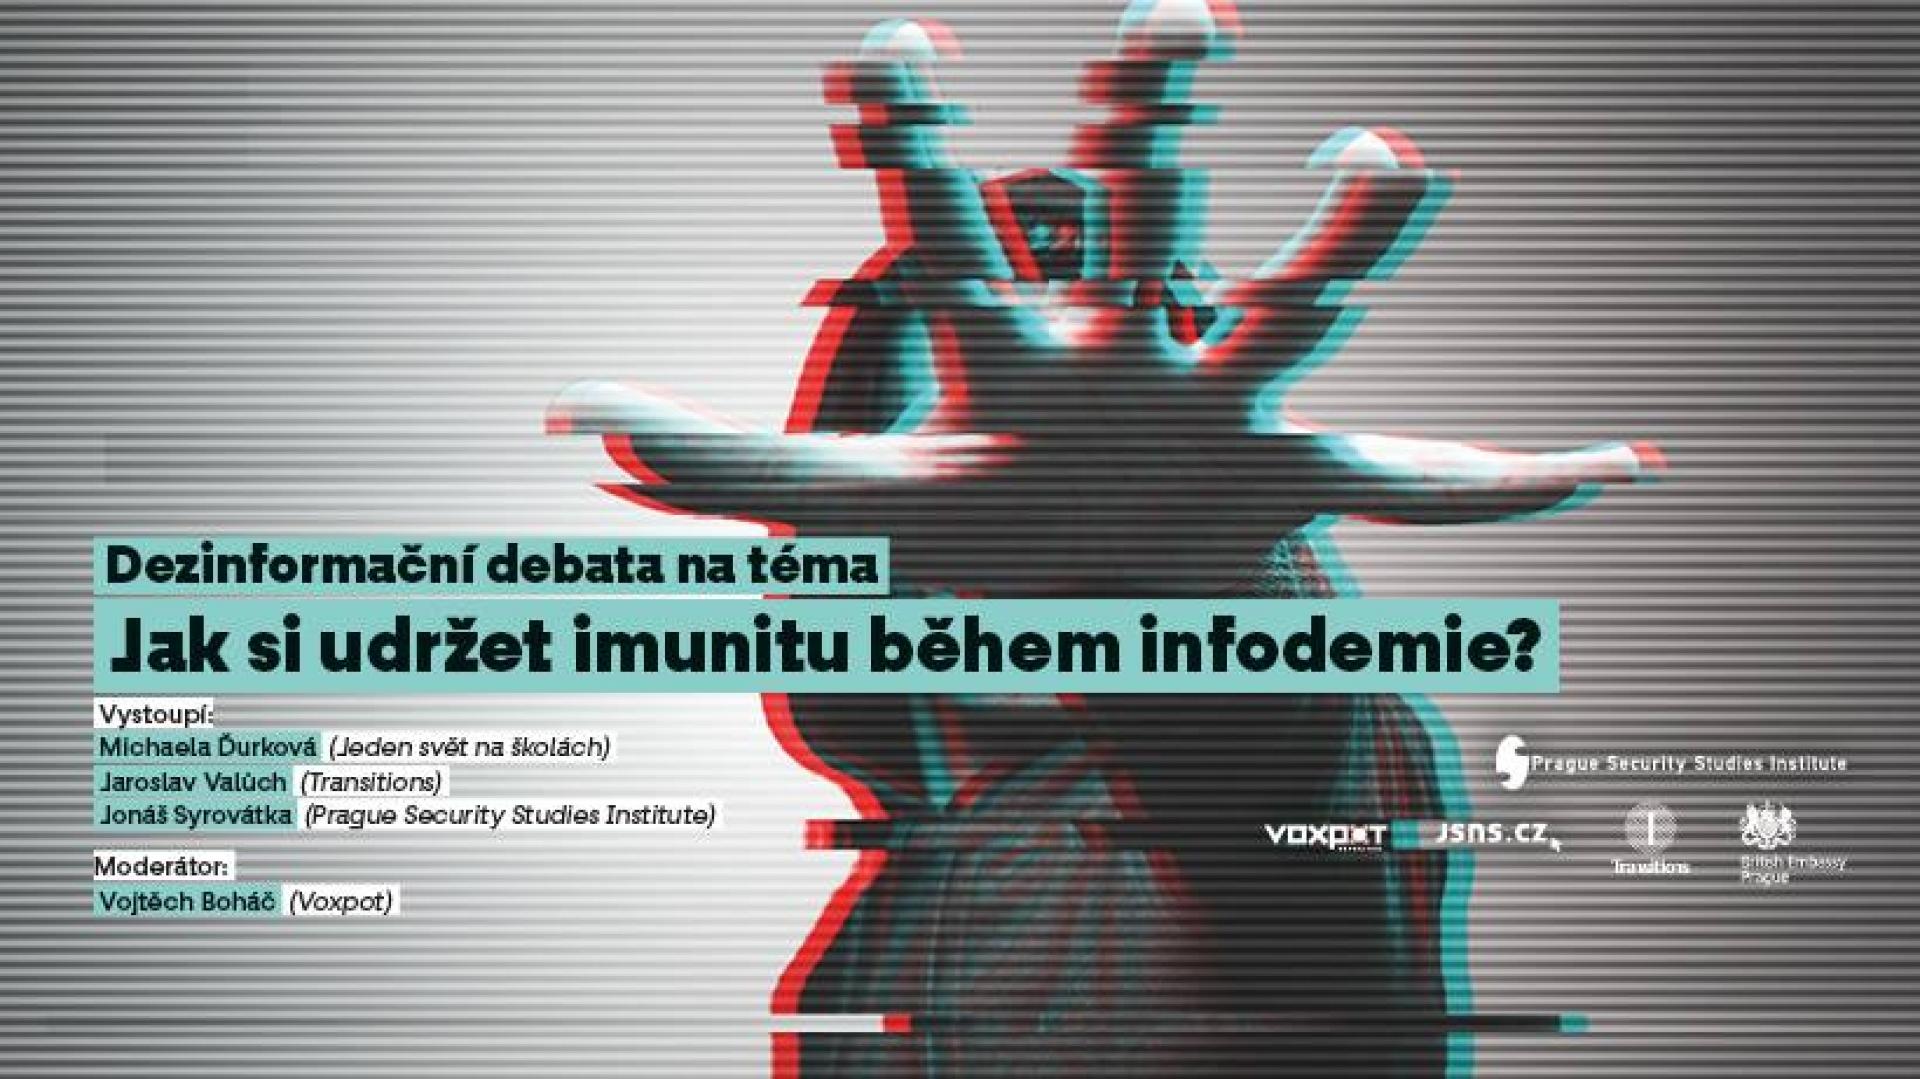 Deziformační debata 02